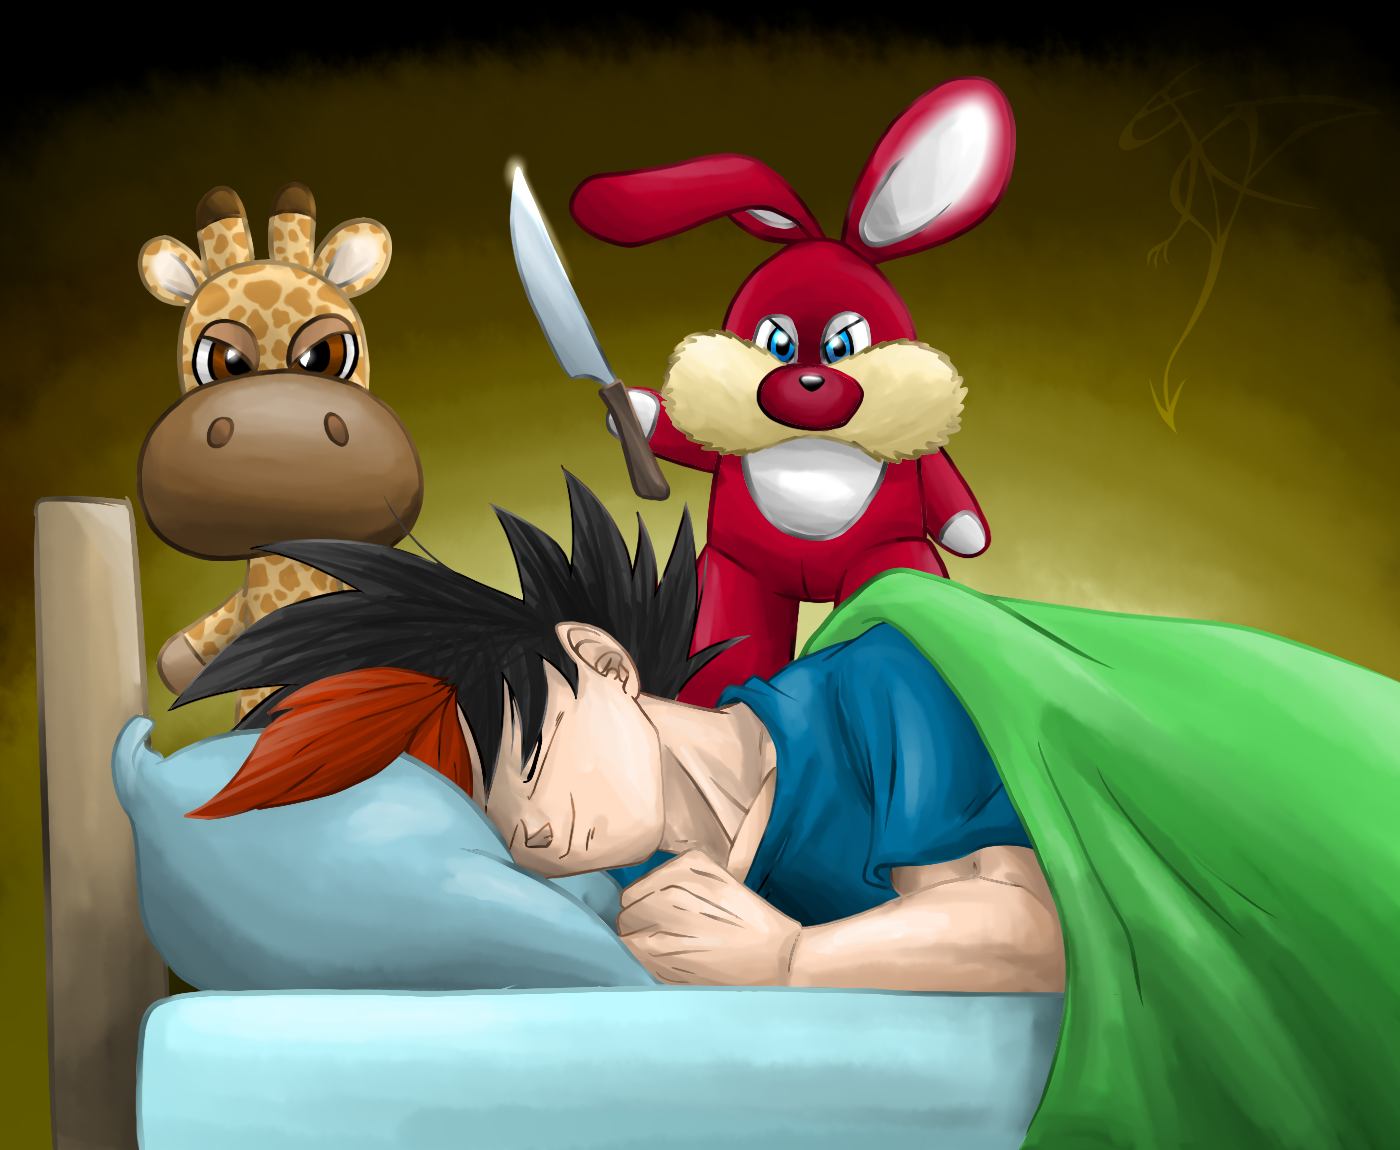 [RYSUNKI]- czyli mini Deviant Saf Dream_by_fandragonball-d5d8nsp